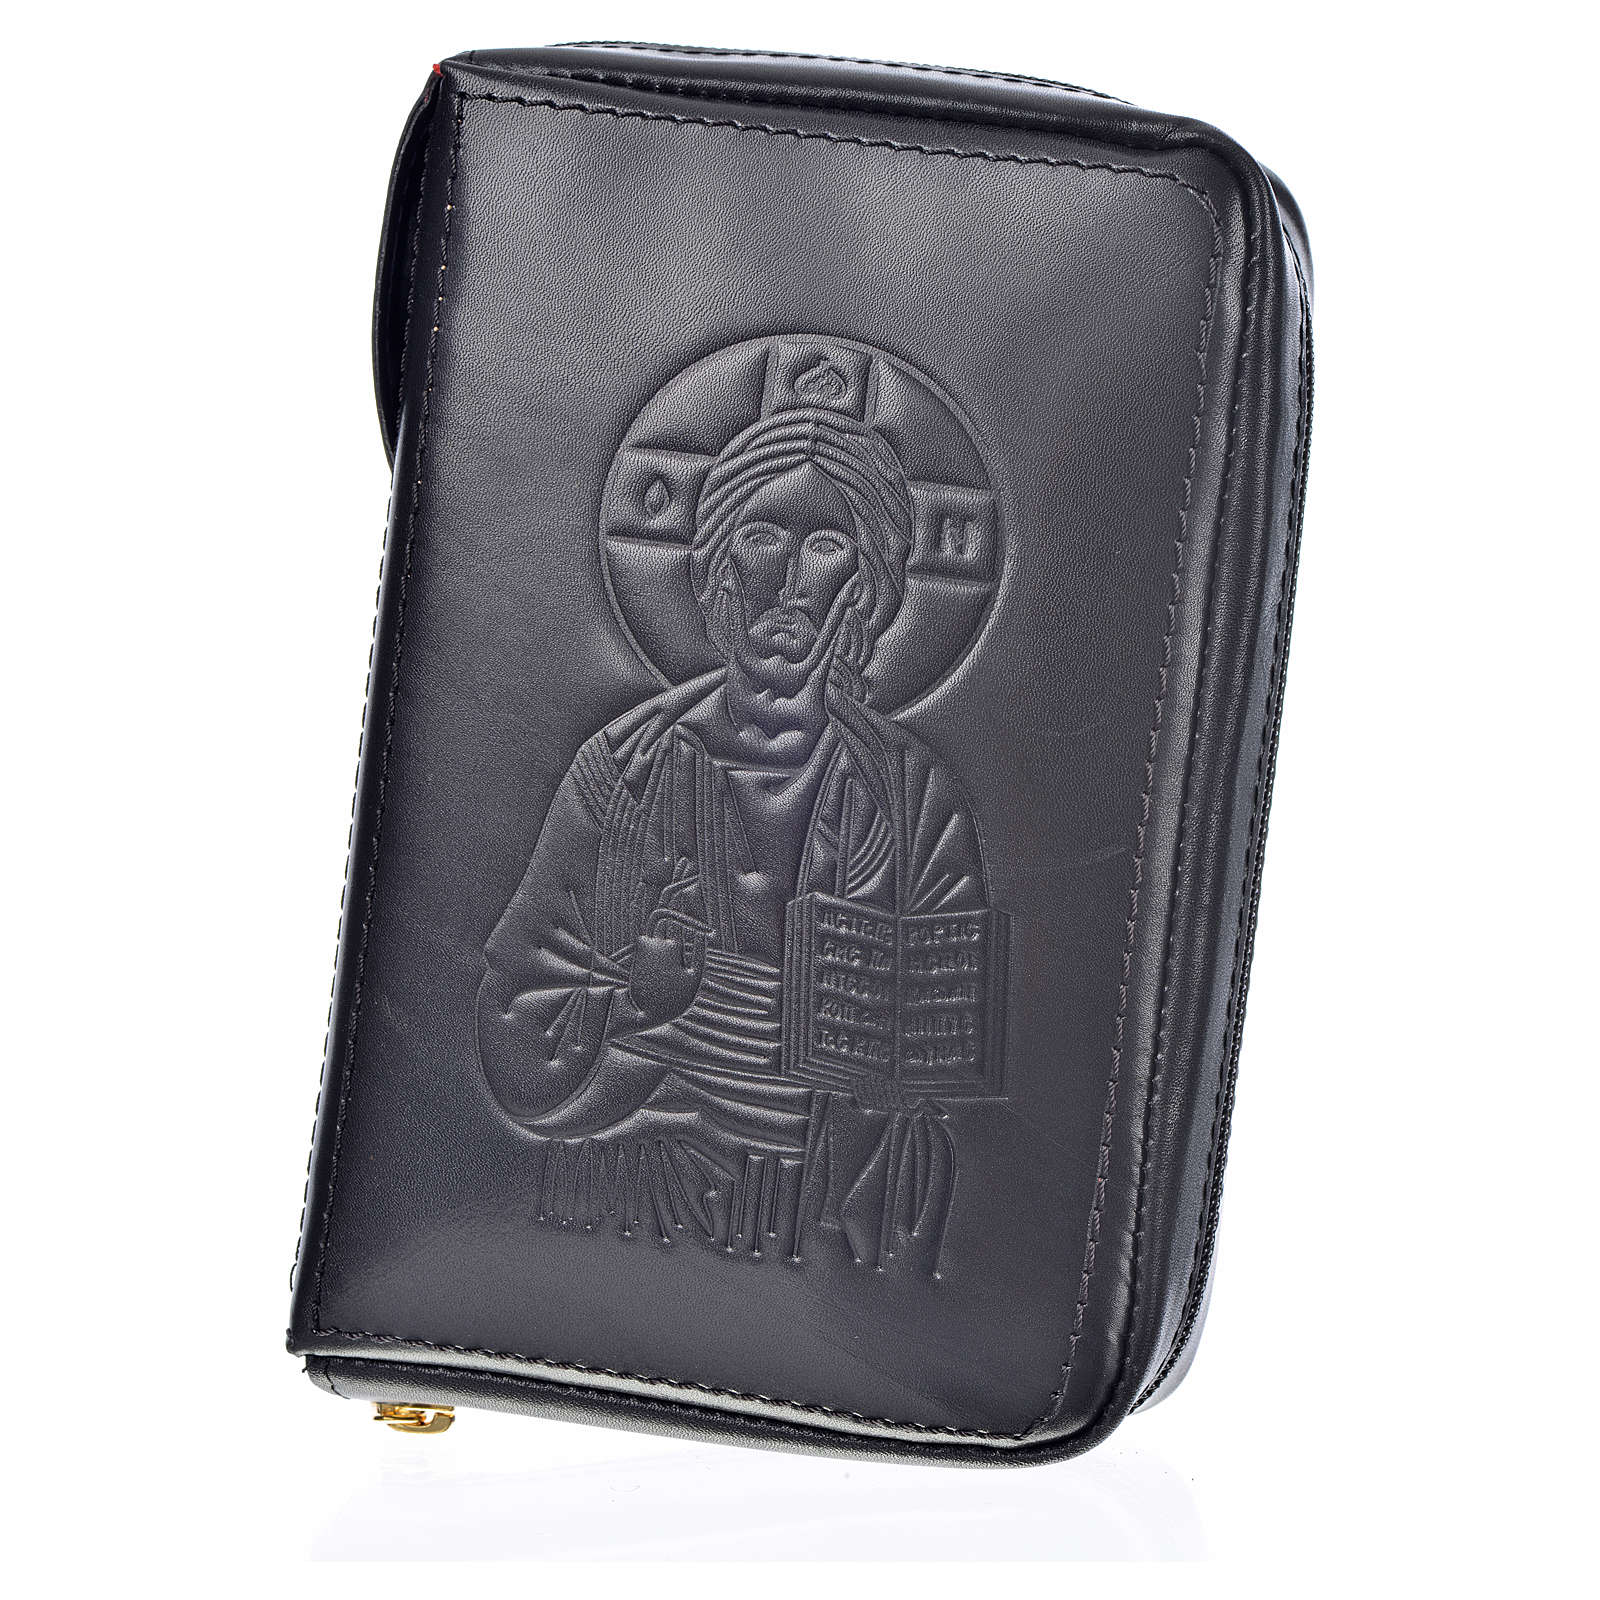 Custodia pelle nera lit. 4 vol. Pantocratore Madonna 4